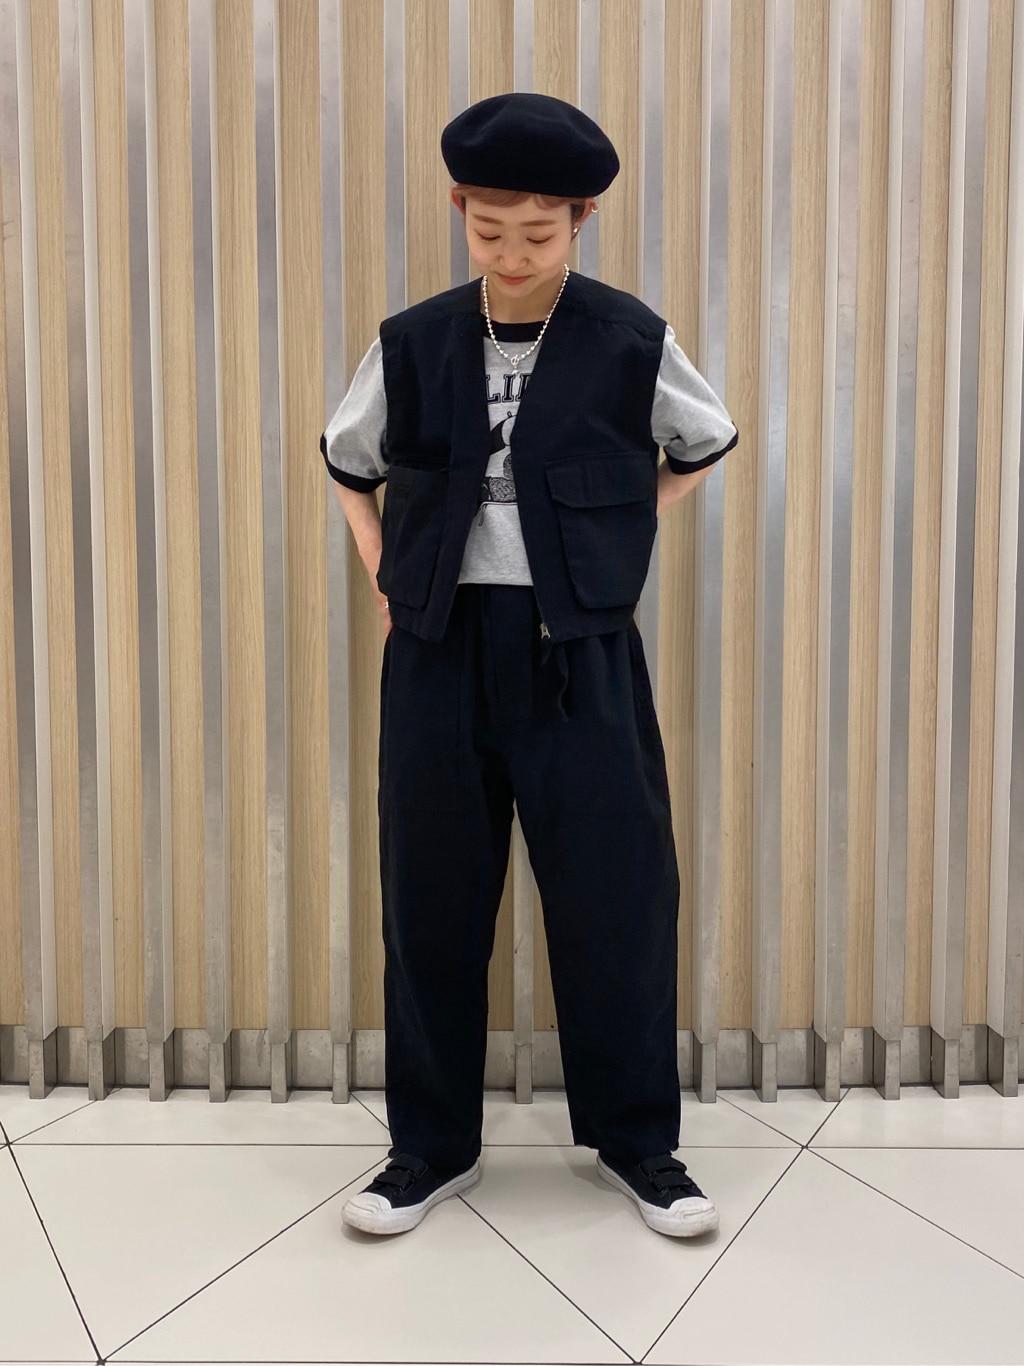 CHILD WOMAN , PAR ICI 東京スカイツリータウン・ソラマチ 2021.05.03